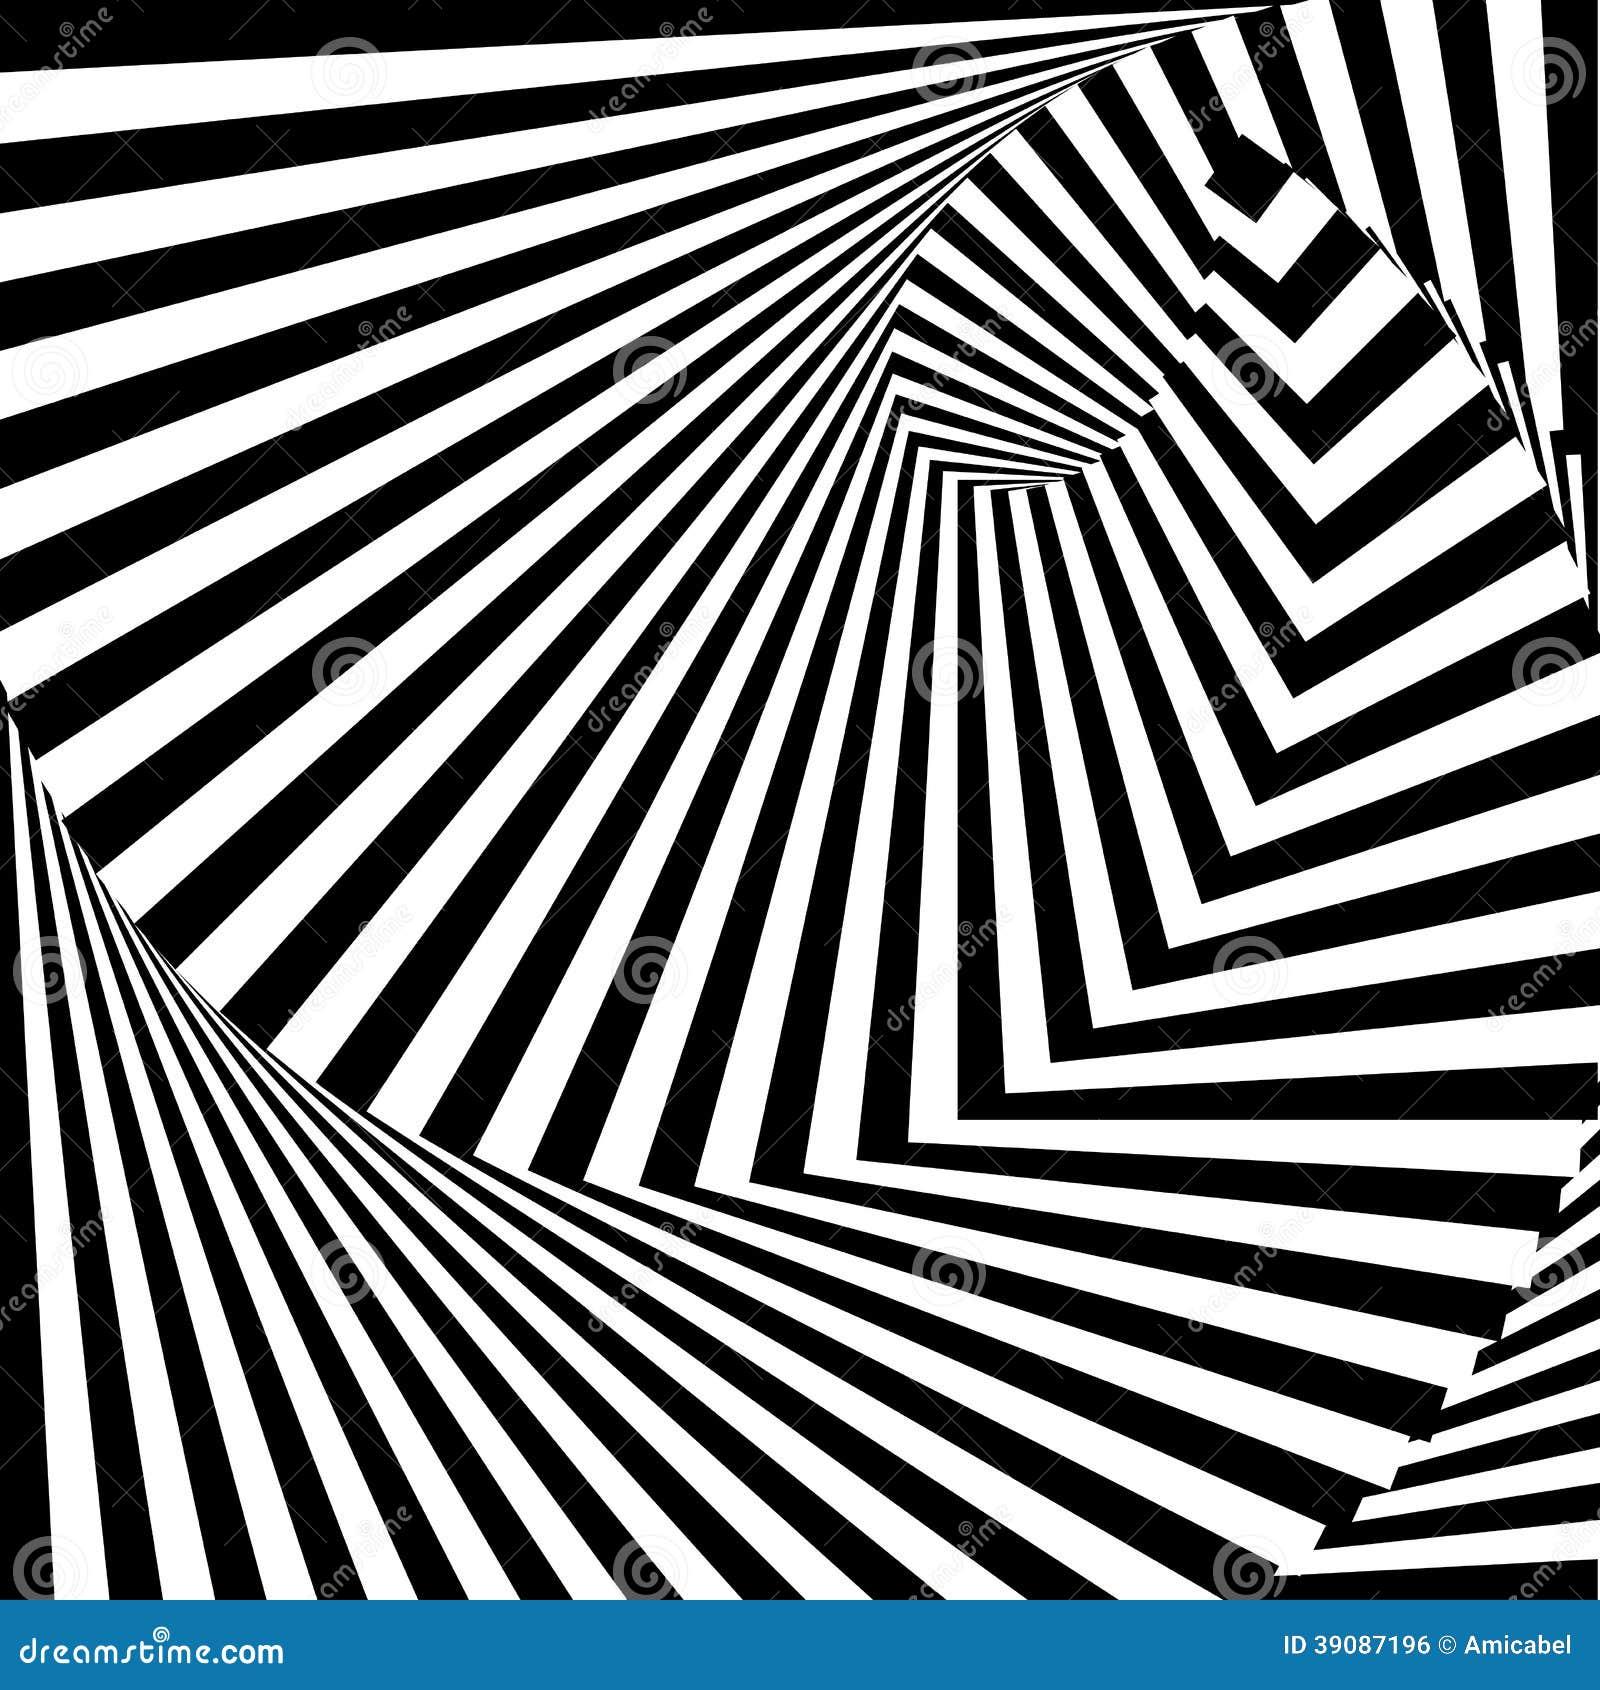 Line Movement Art : Design monochrome vortex illusion background stock vector